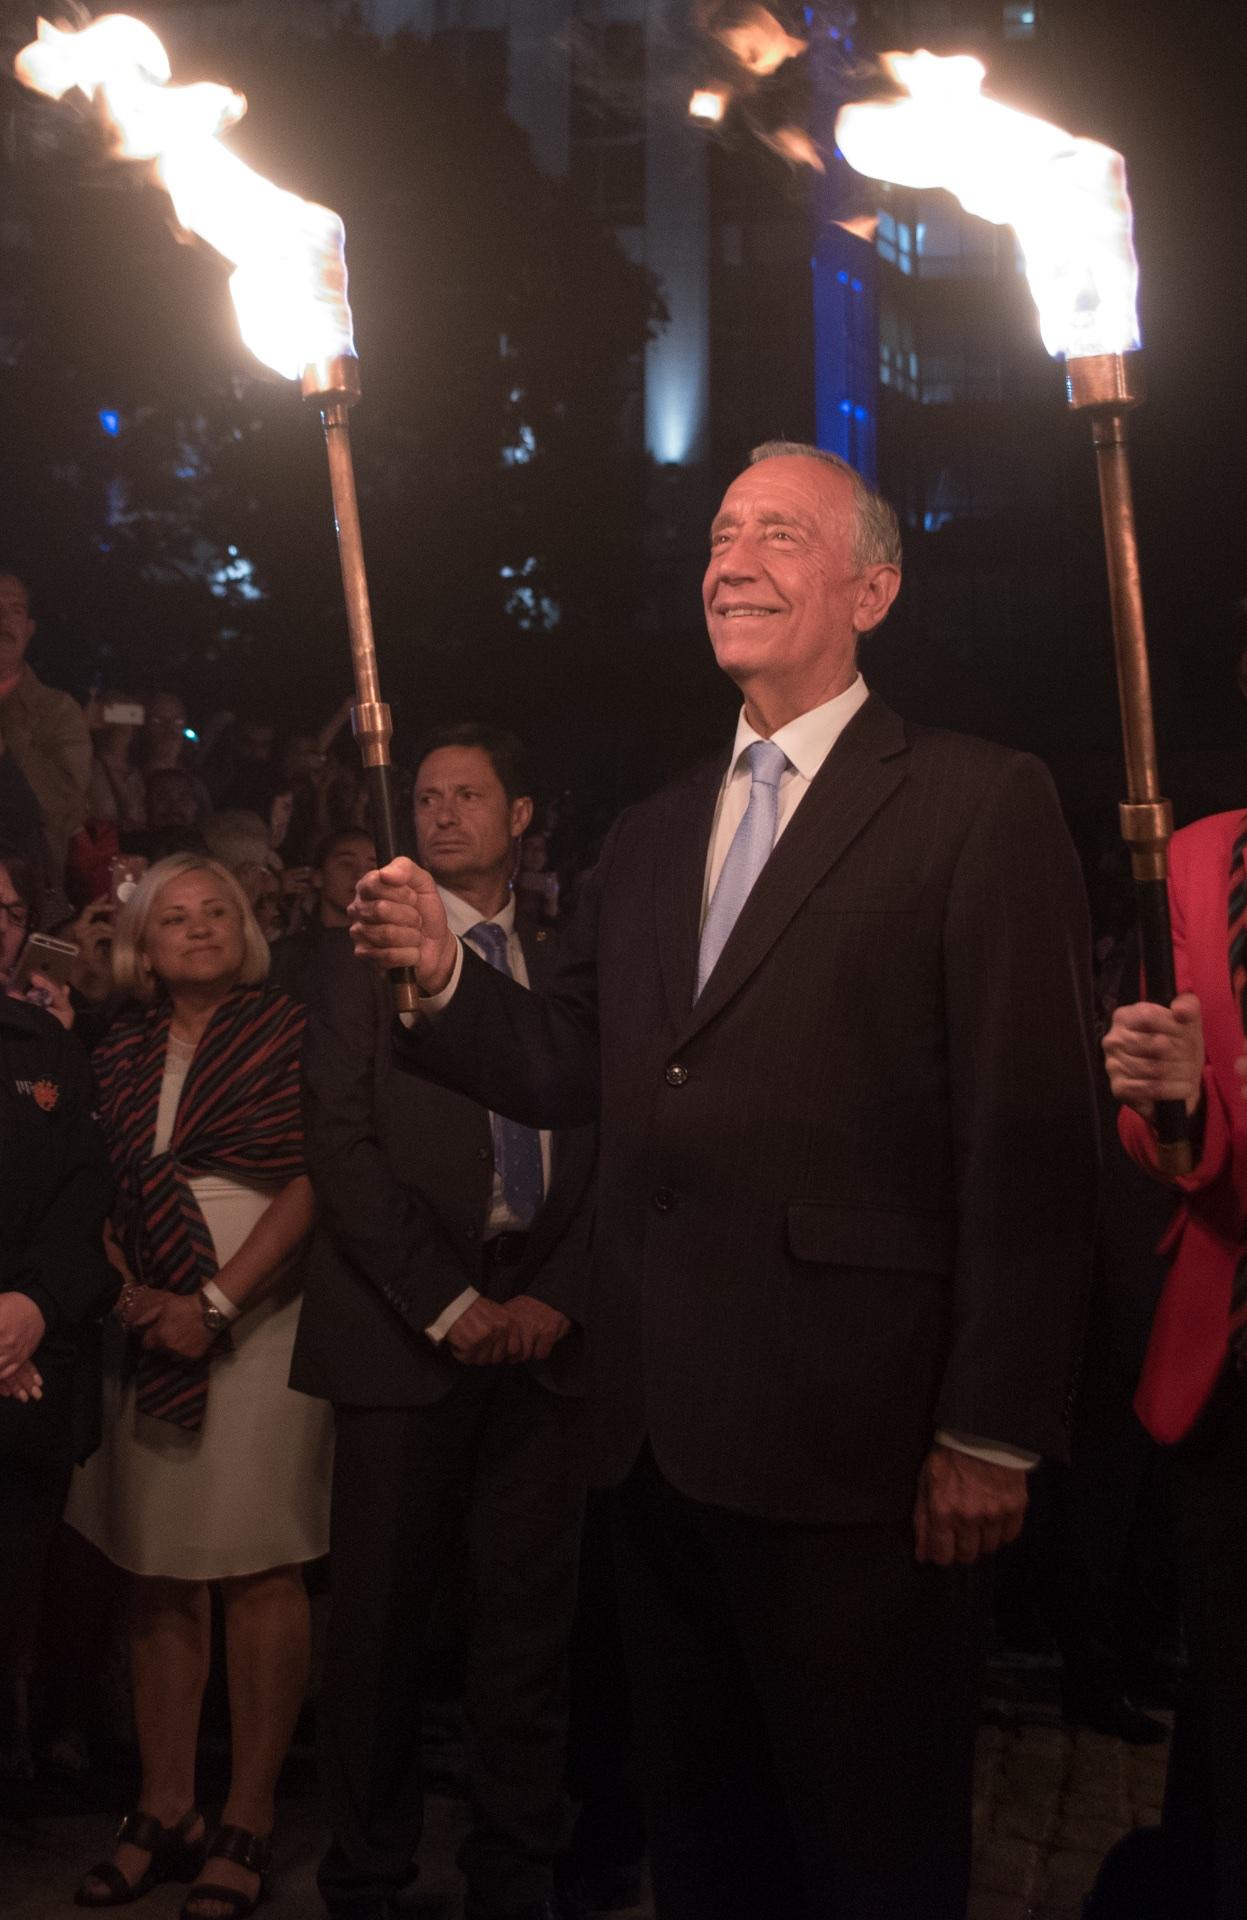 portuguese-president-marcelo-rebelo-de-sousa-lighting-waterfire-for-ri-day-of-portugal_40984418080_o